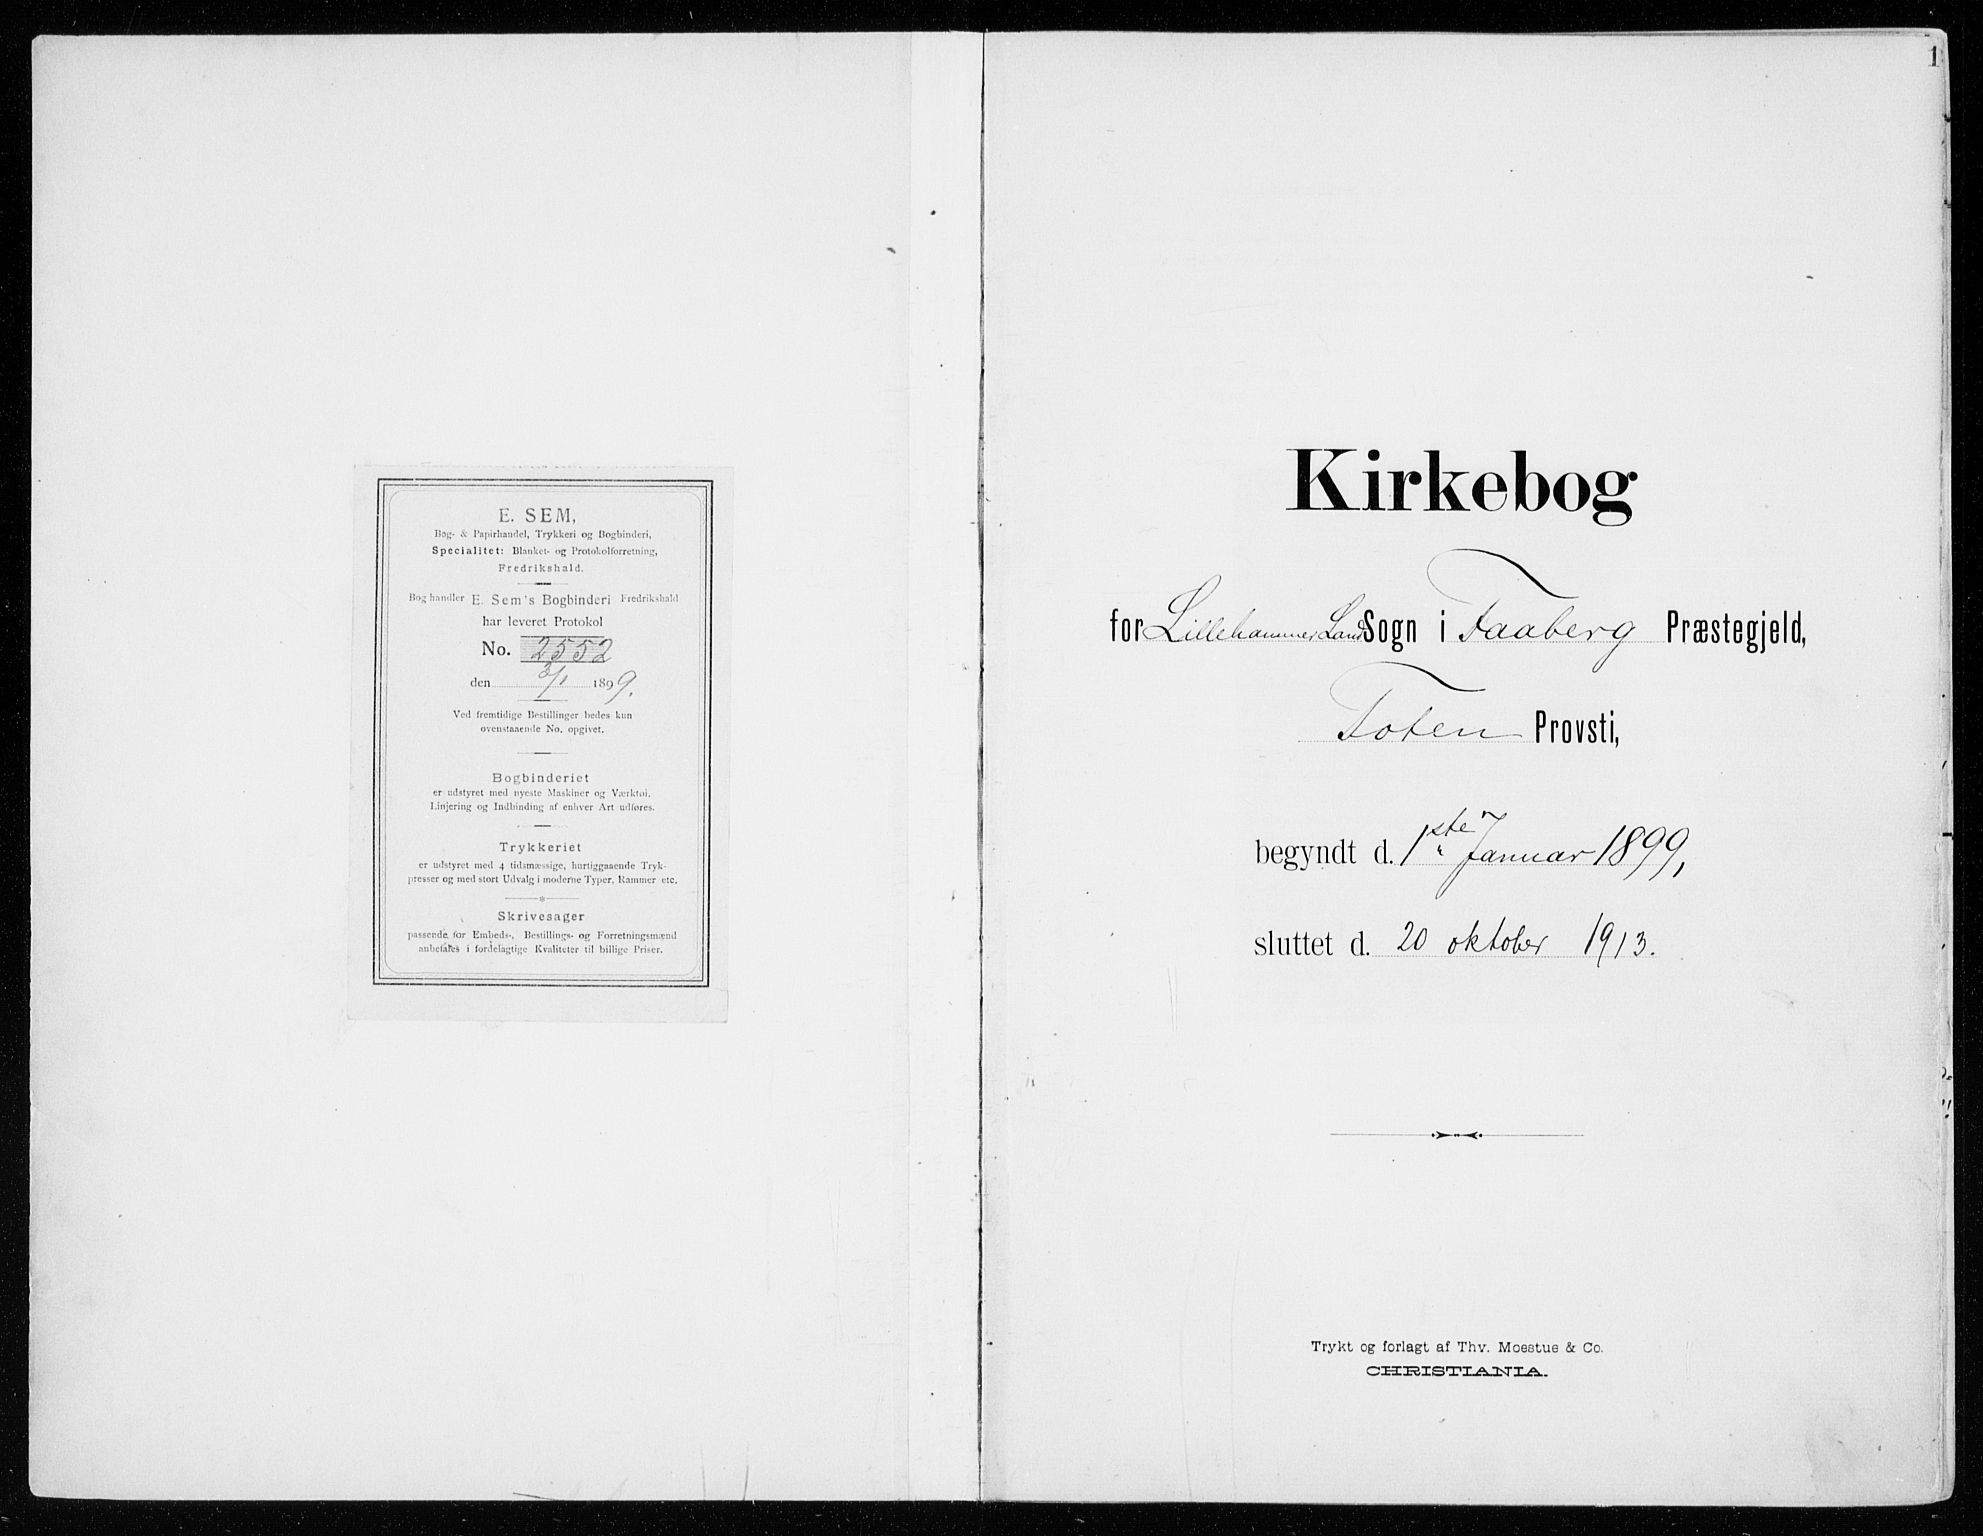 SAH, Fåberg prestekontor, H/Ha/Haa/L0011: Parish register (official) no. 11, 1899-1913, p. 1